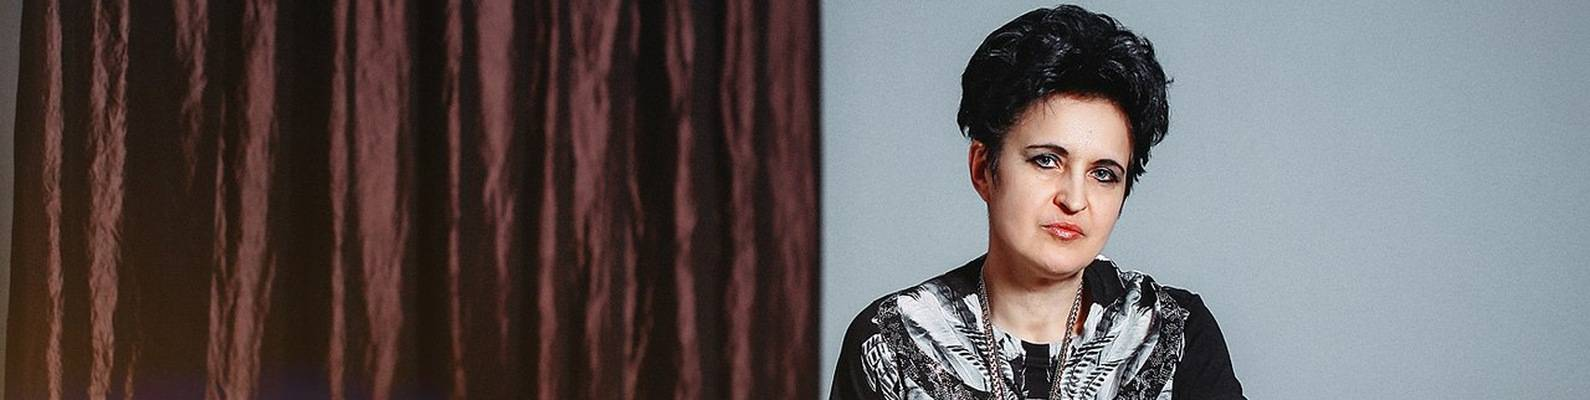 "Елена голунова ℹ️ биография, участие в ""битве экстрасенсов"", мама влада кадони, фото, предсказания, кто был на приеме, правда и ложь, отзывы"